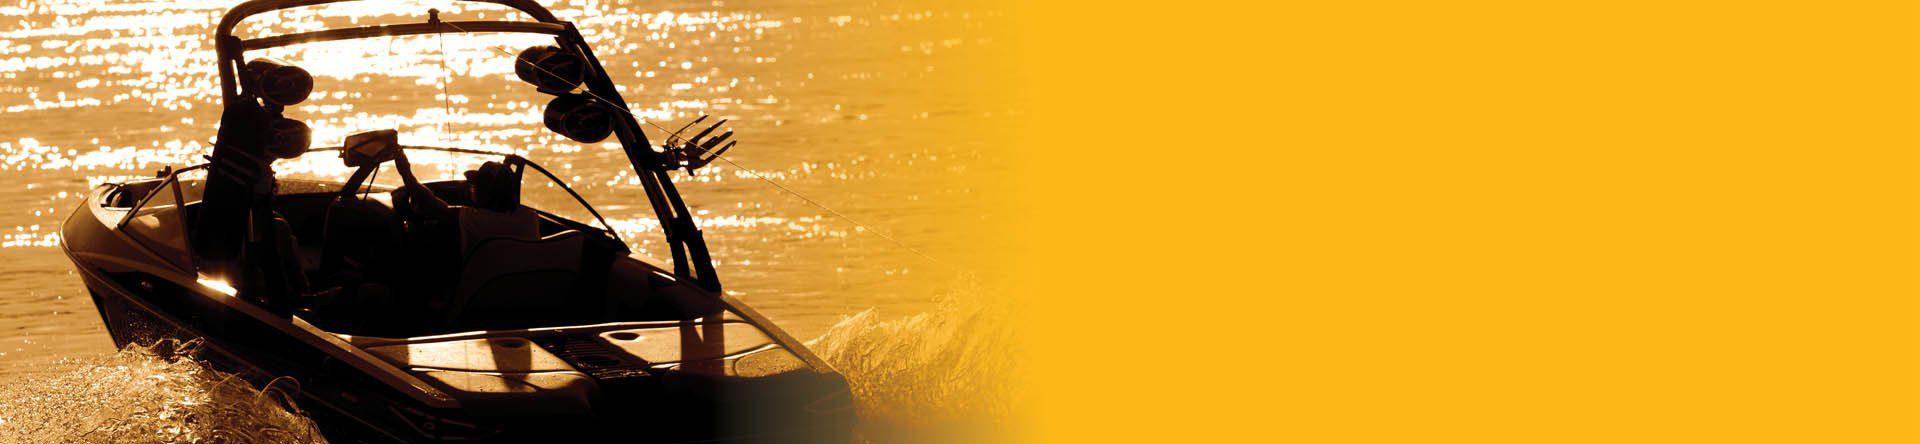 Get Quick Boat Finance at Finance Ezi